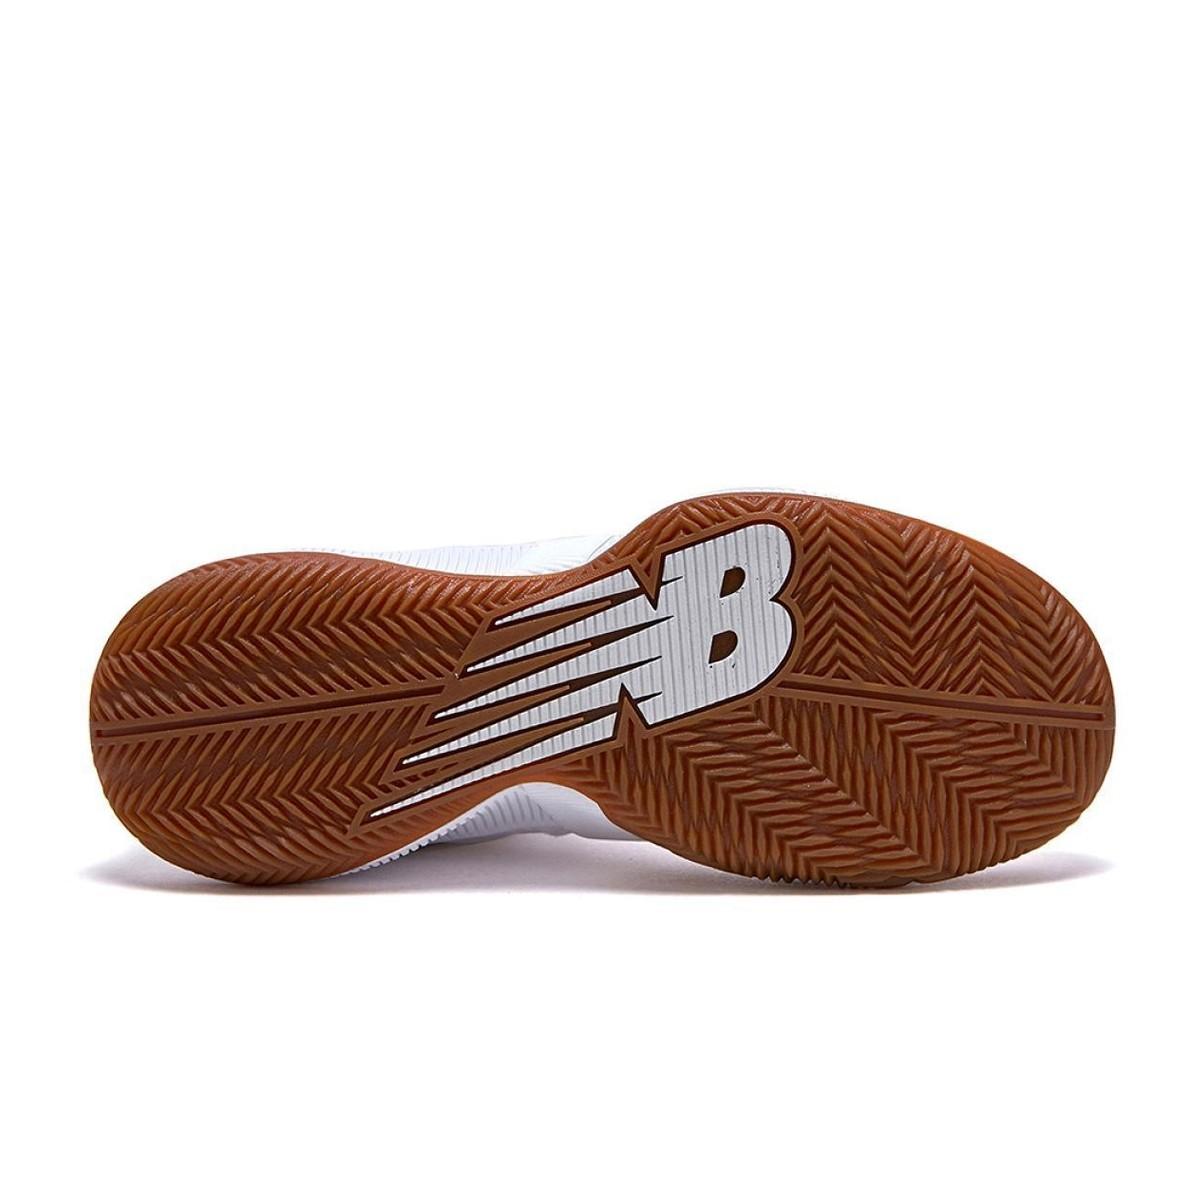 New Balance OMN1S 'White'-BBOMNXWW